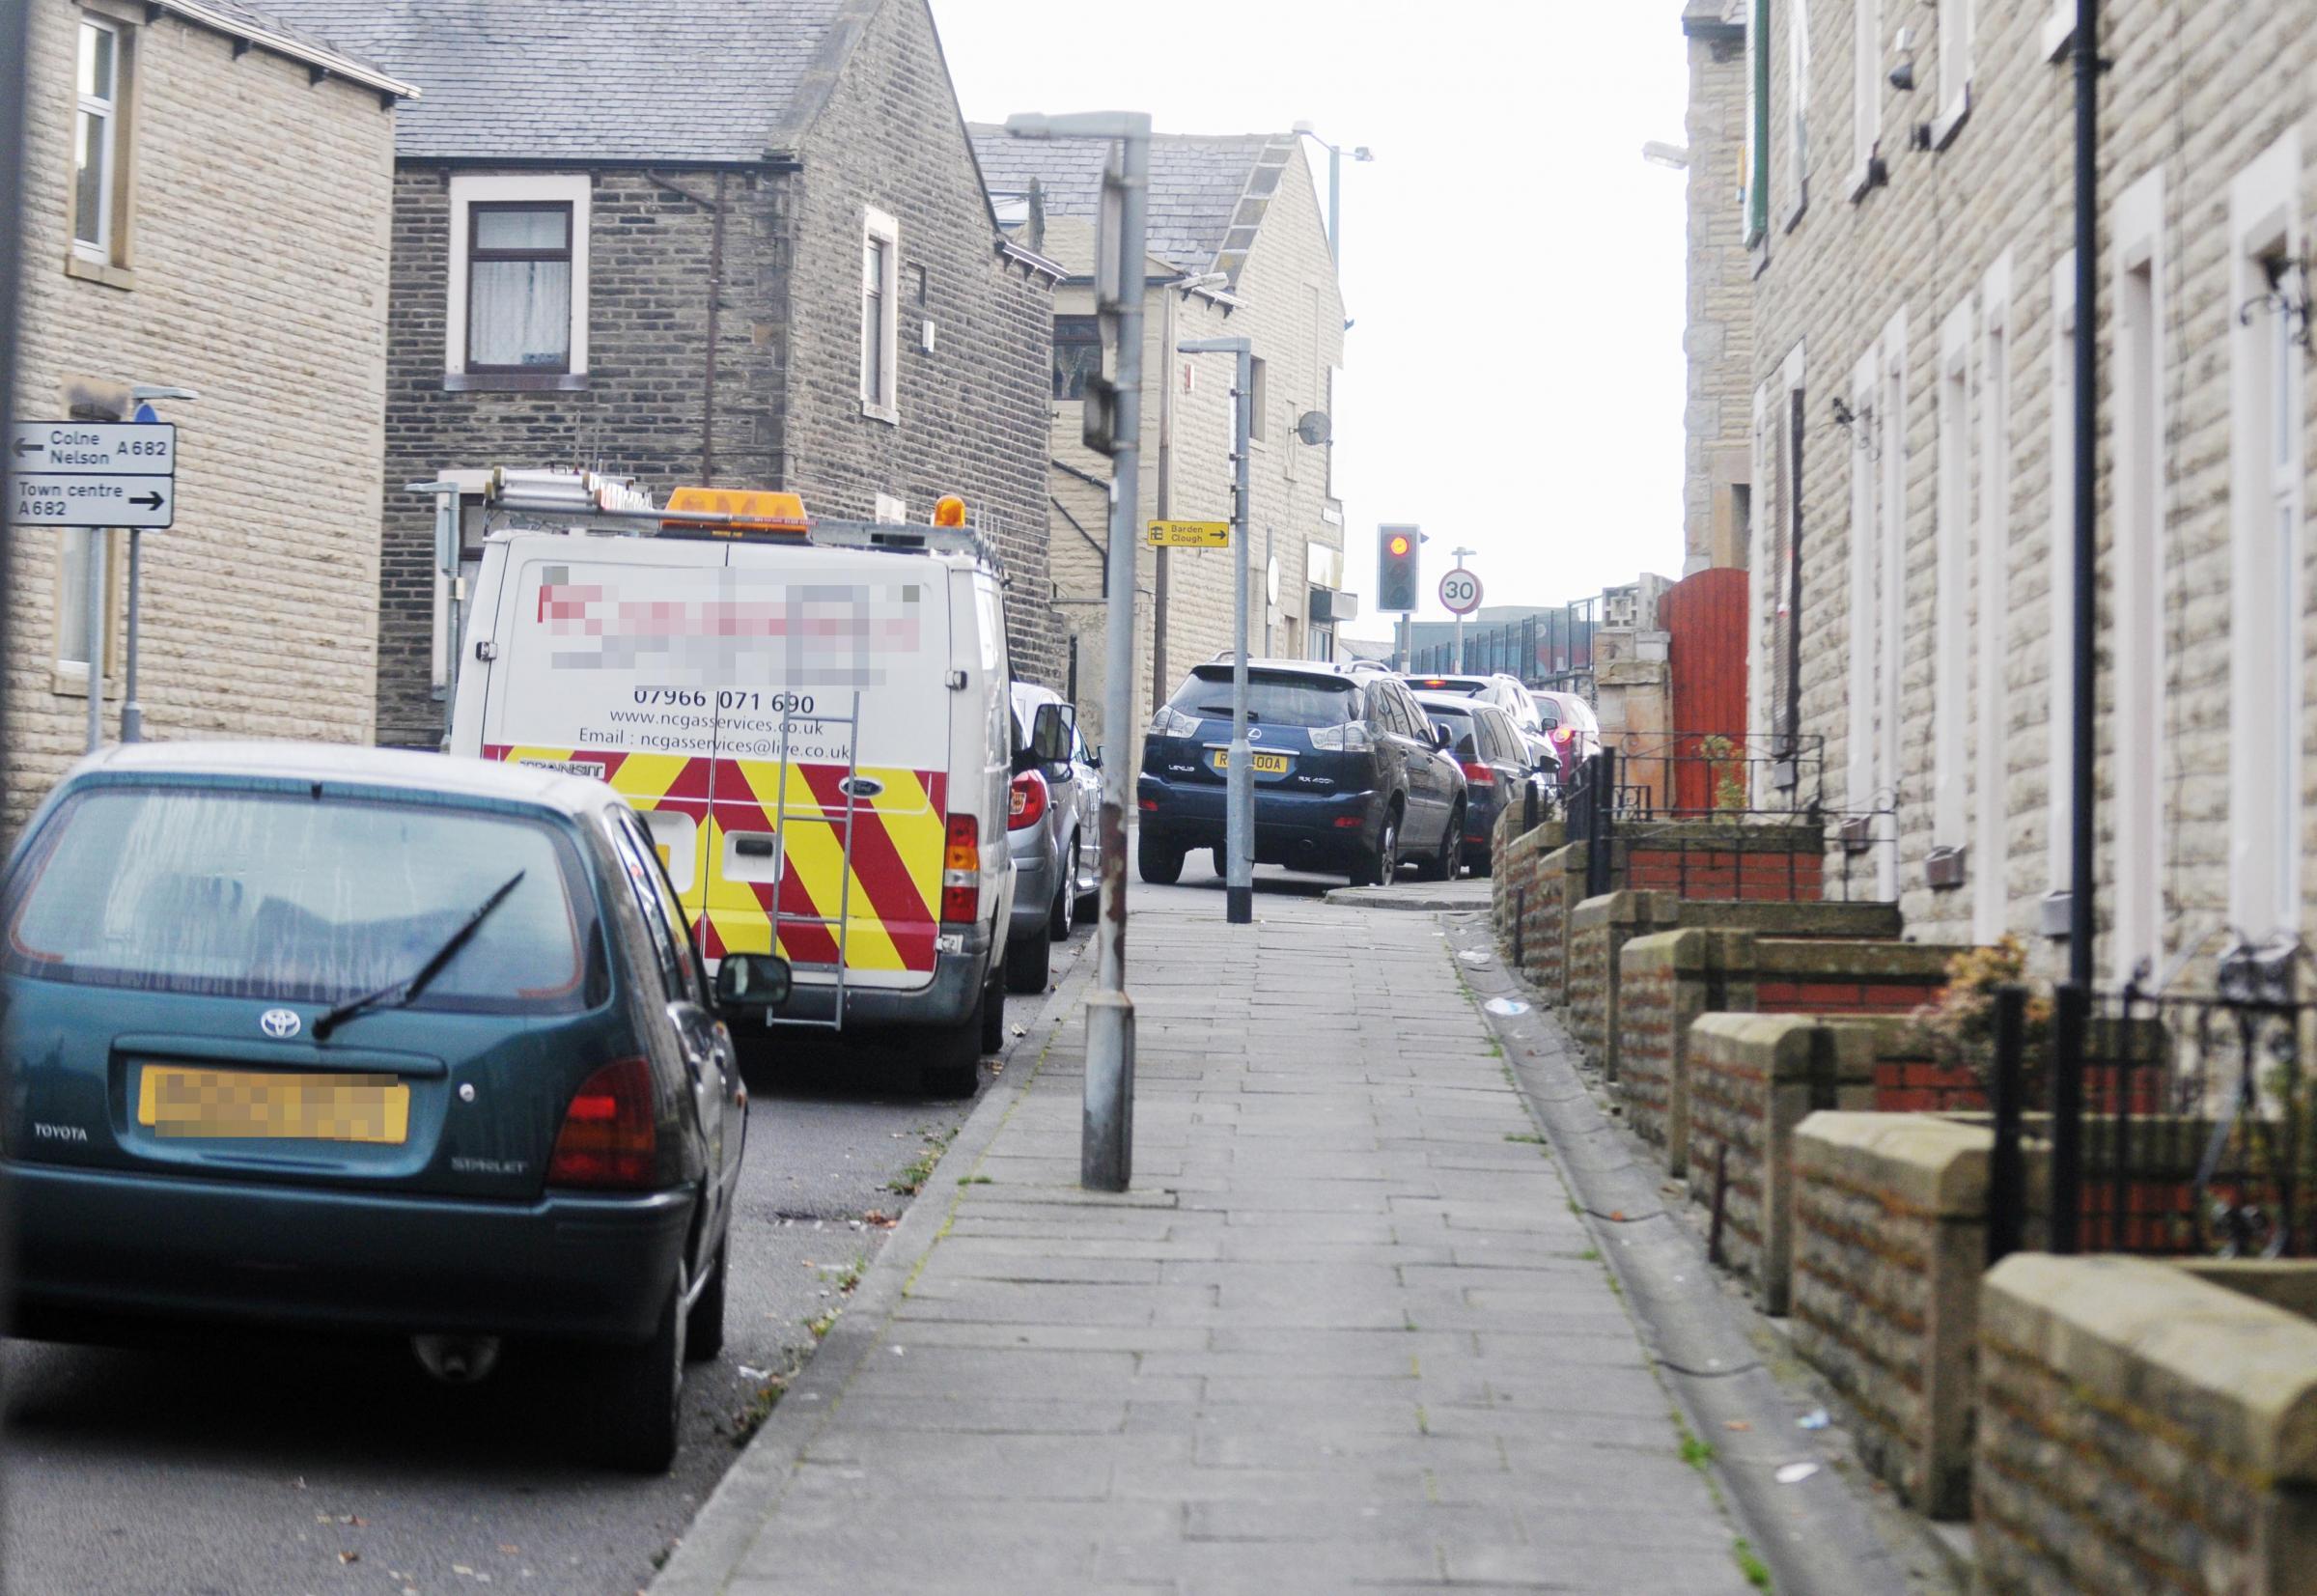 SCENE: Newman Street, Burnley, where the dog attack happened